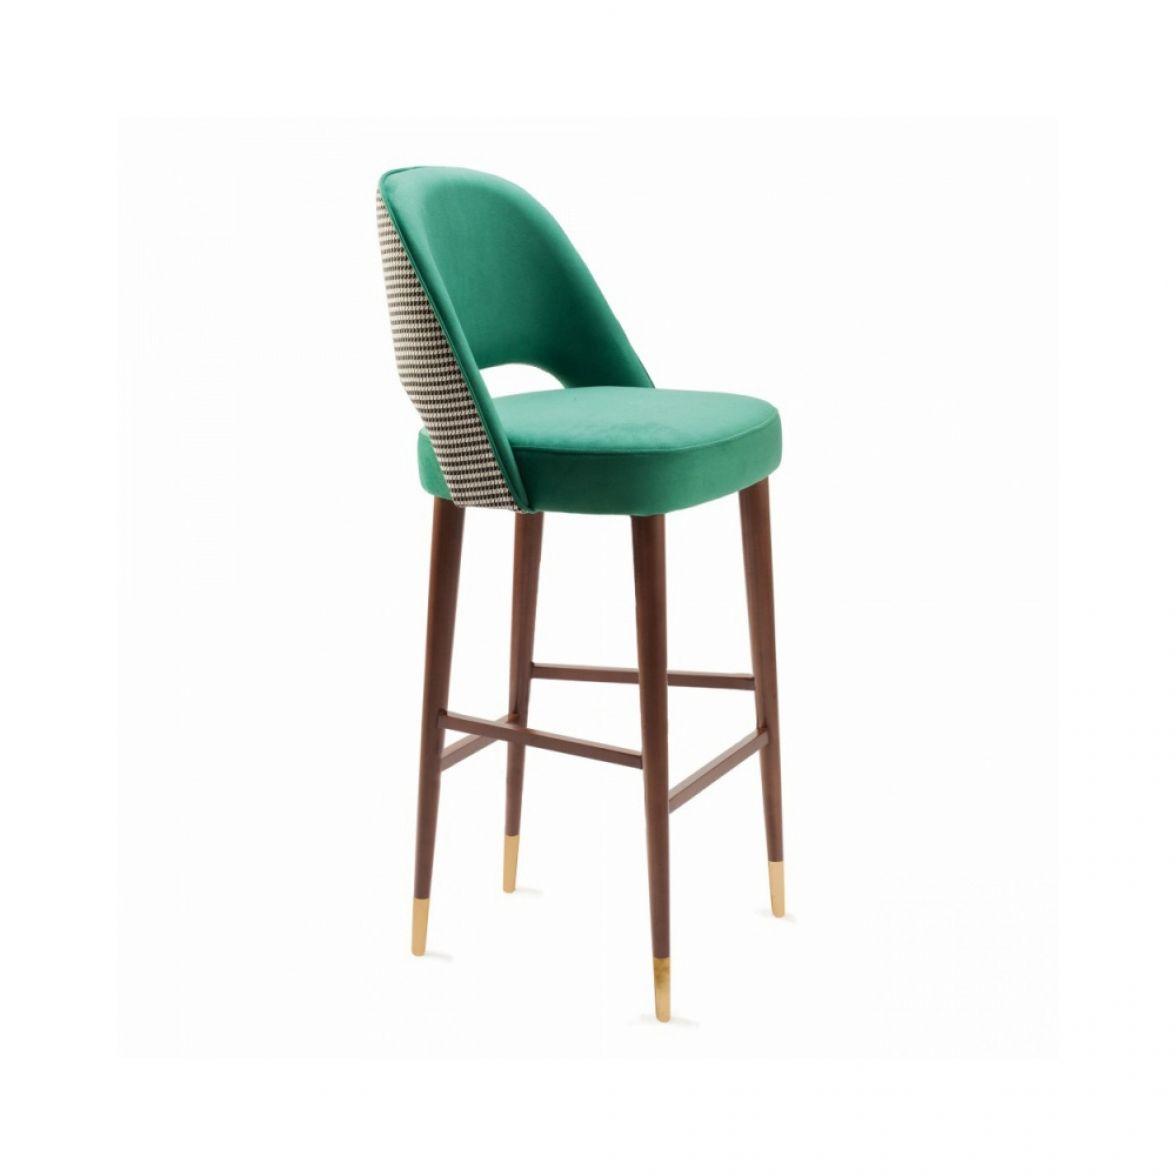 Ava Bar Chair фото цена